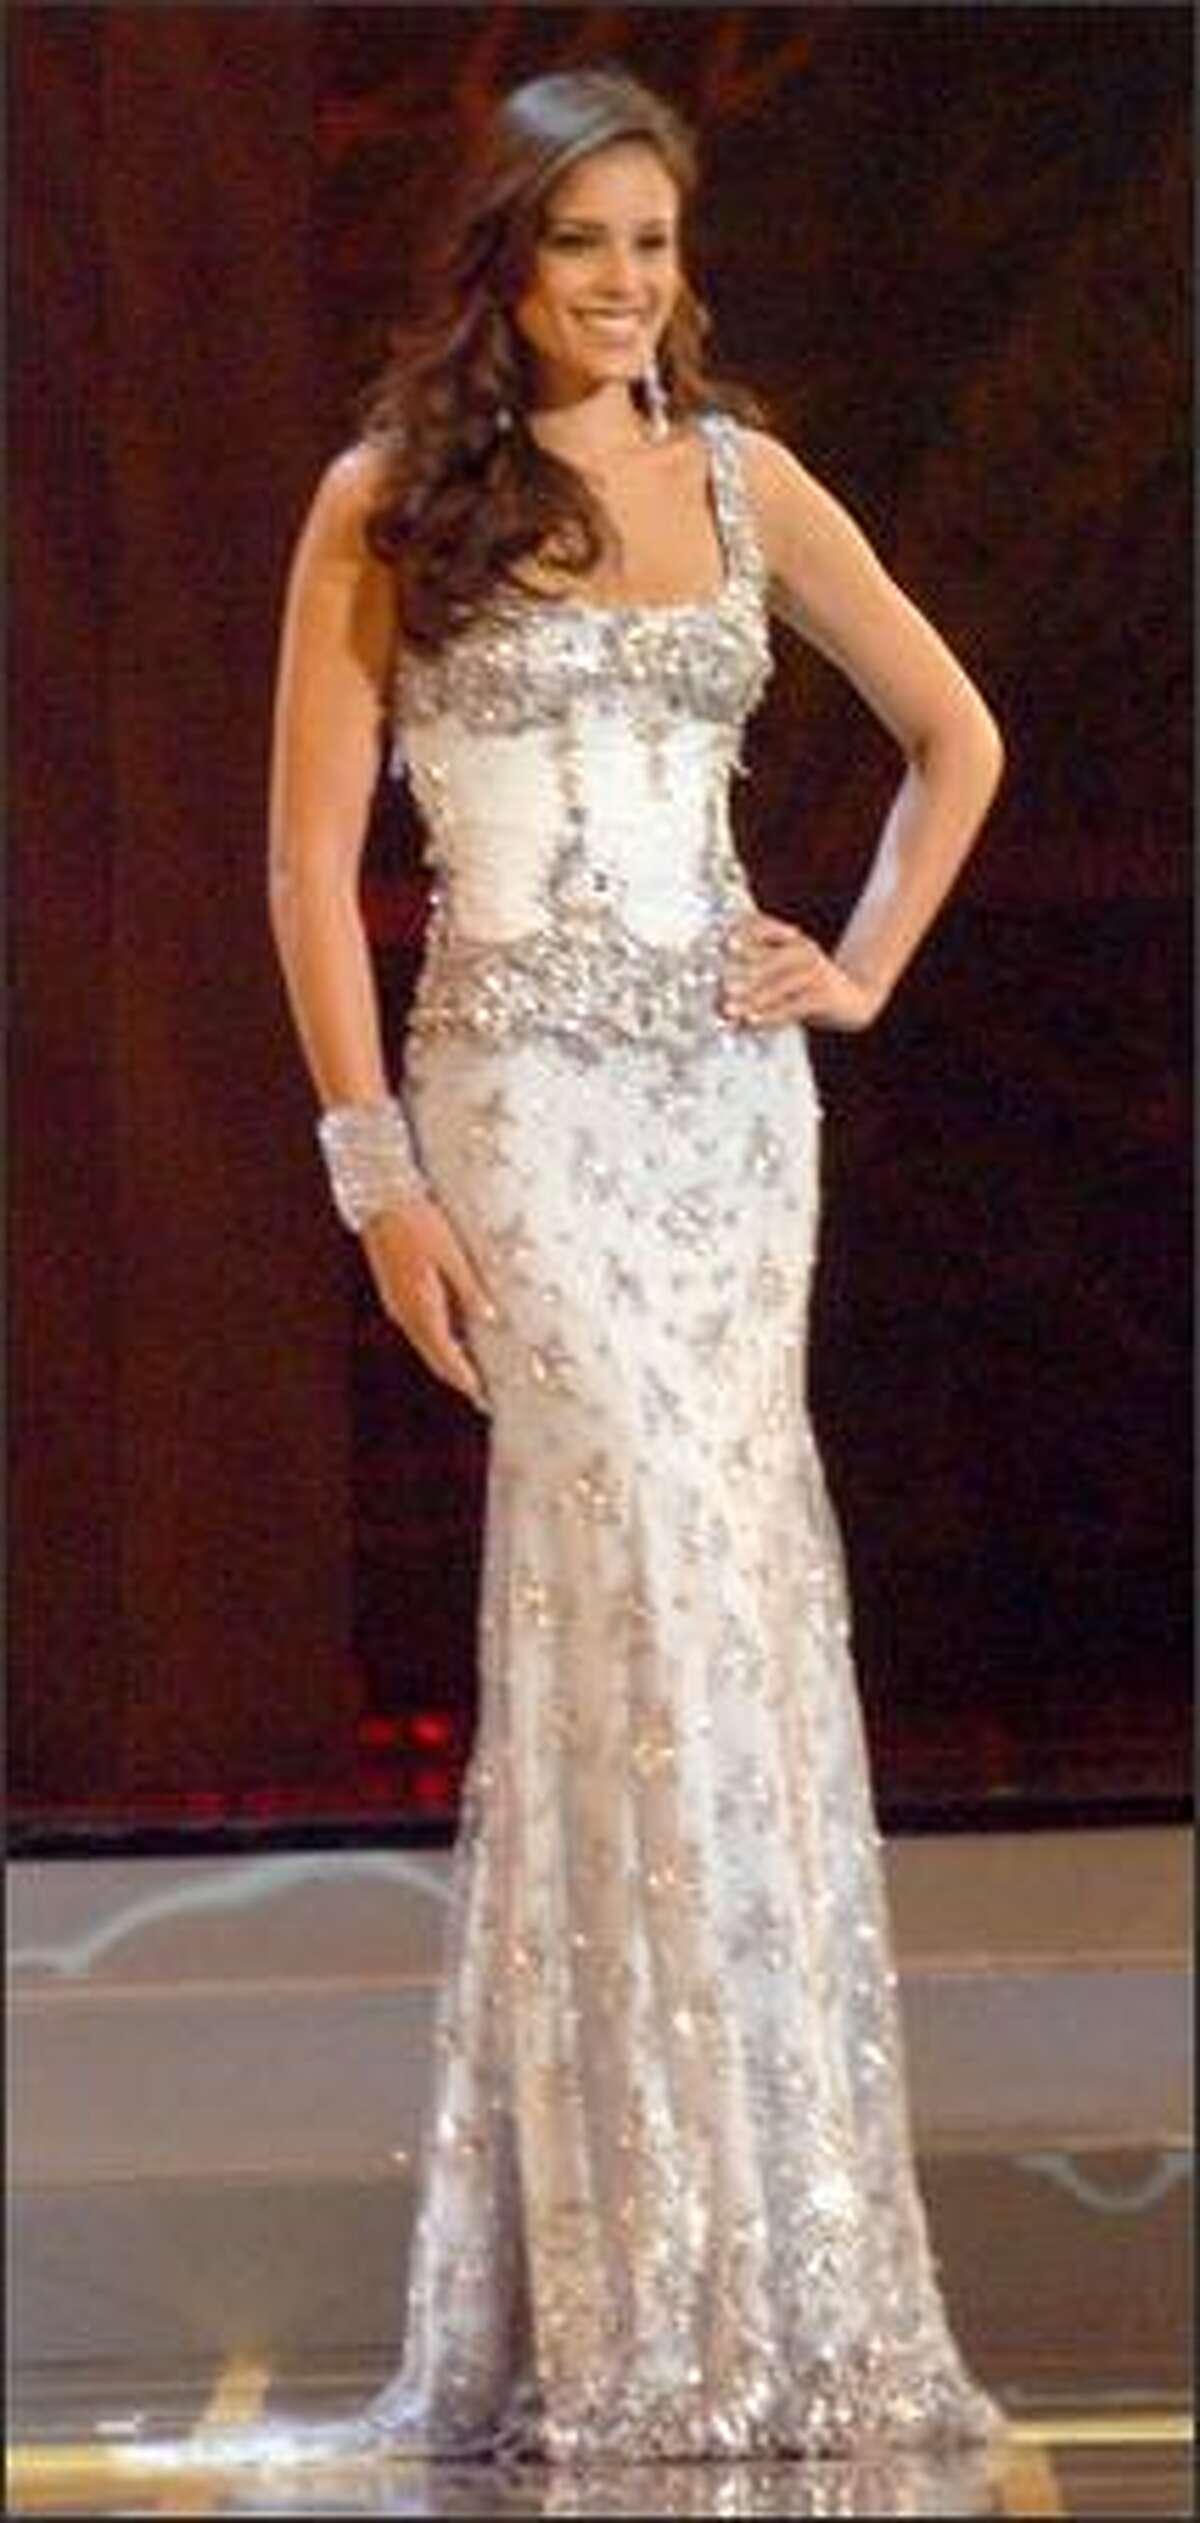 Miss Universe 2005 semi-finalist Renata Soñé, Miss Dominican Republic.